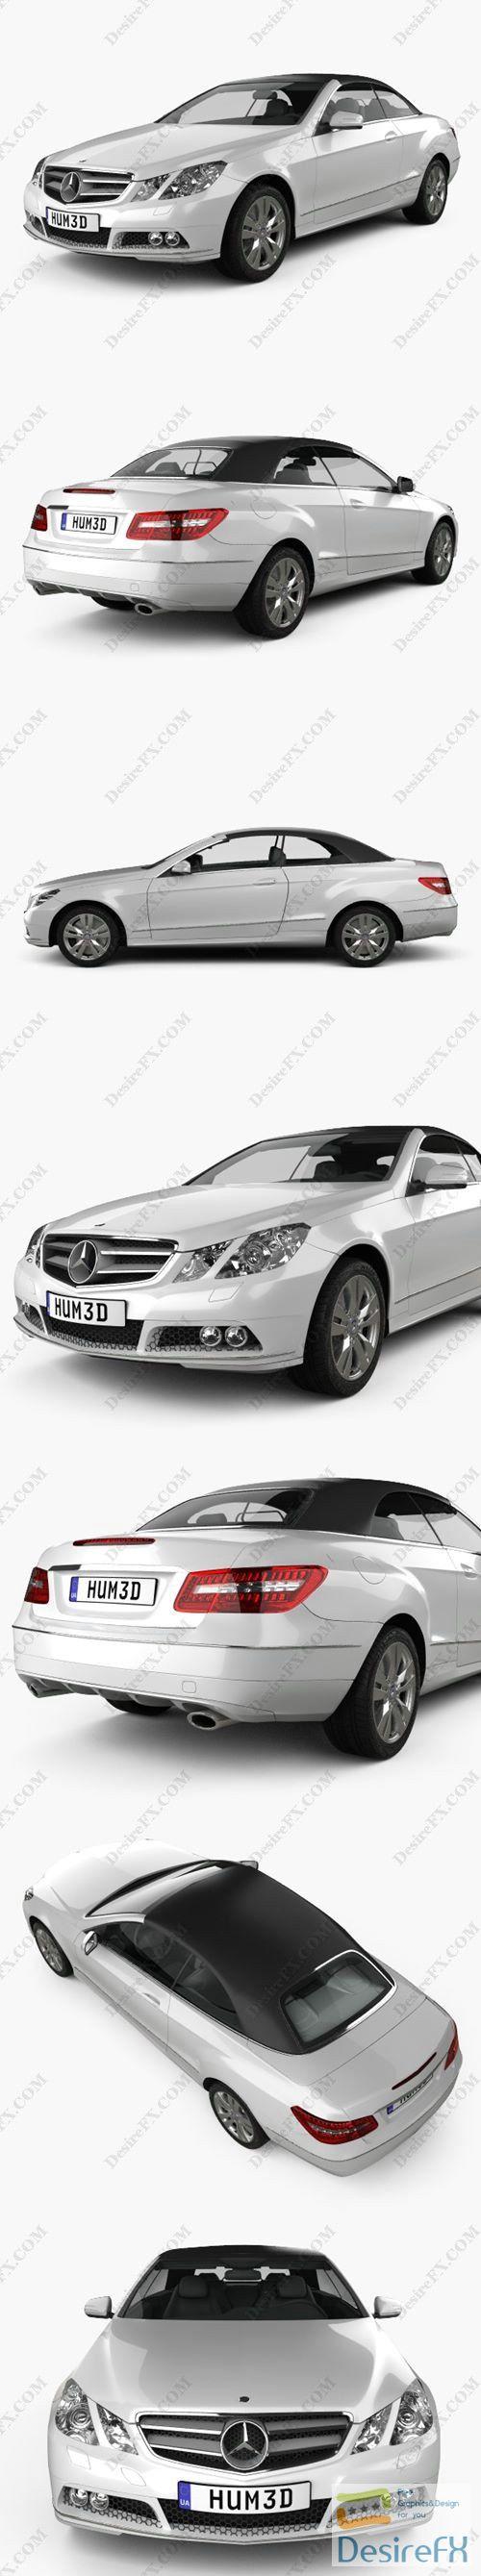 Mercedes-Benz E-Class cabrio 2011 3D Model